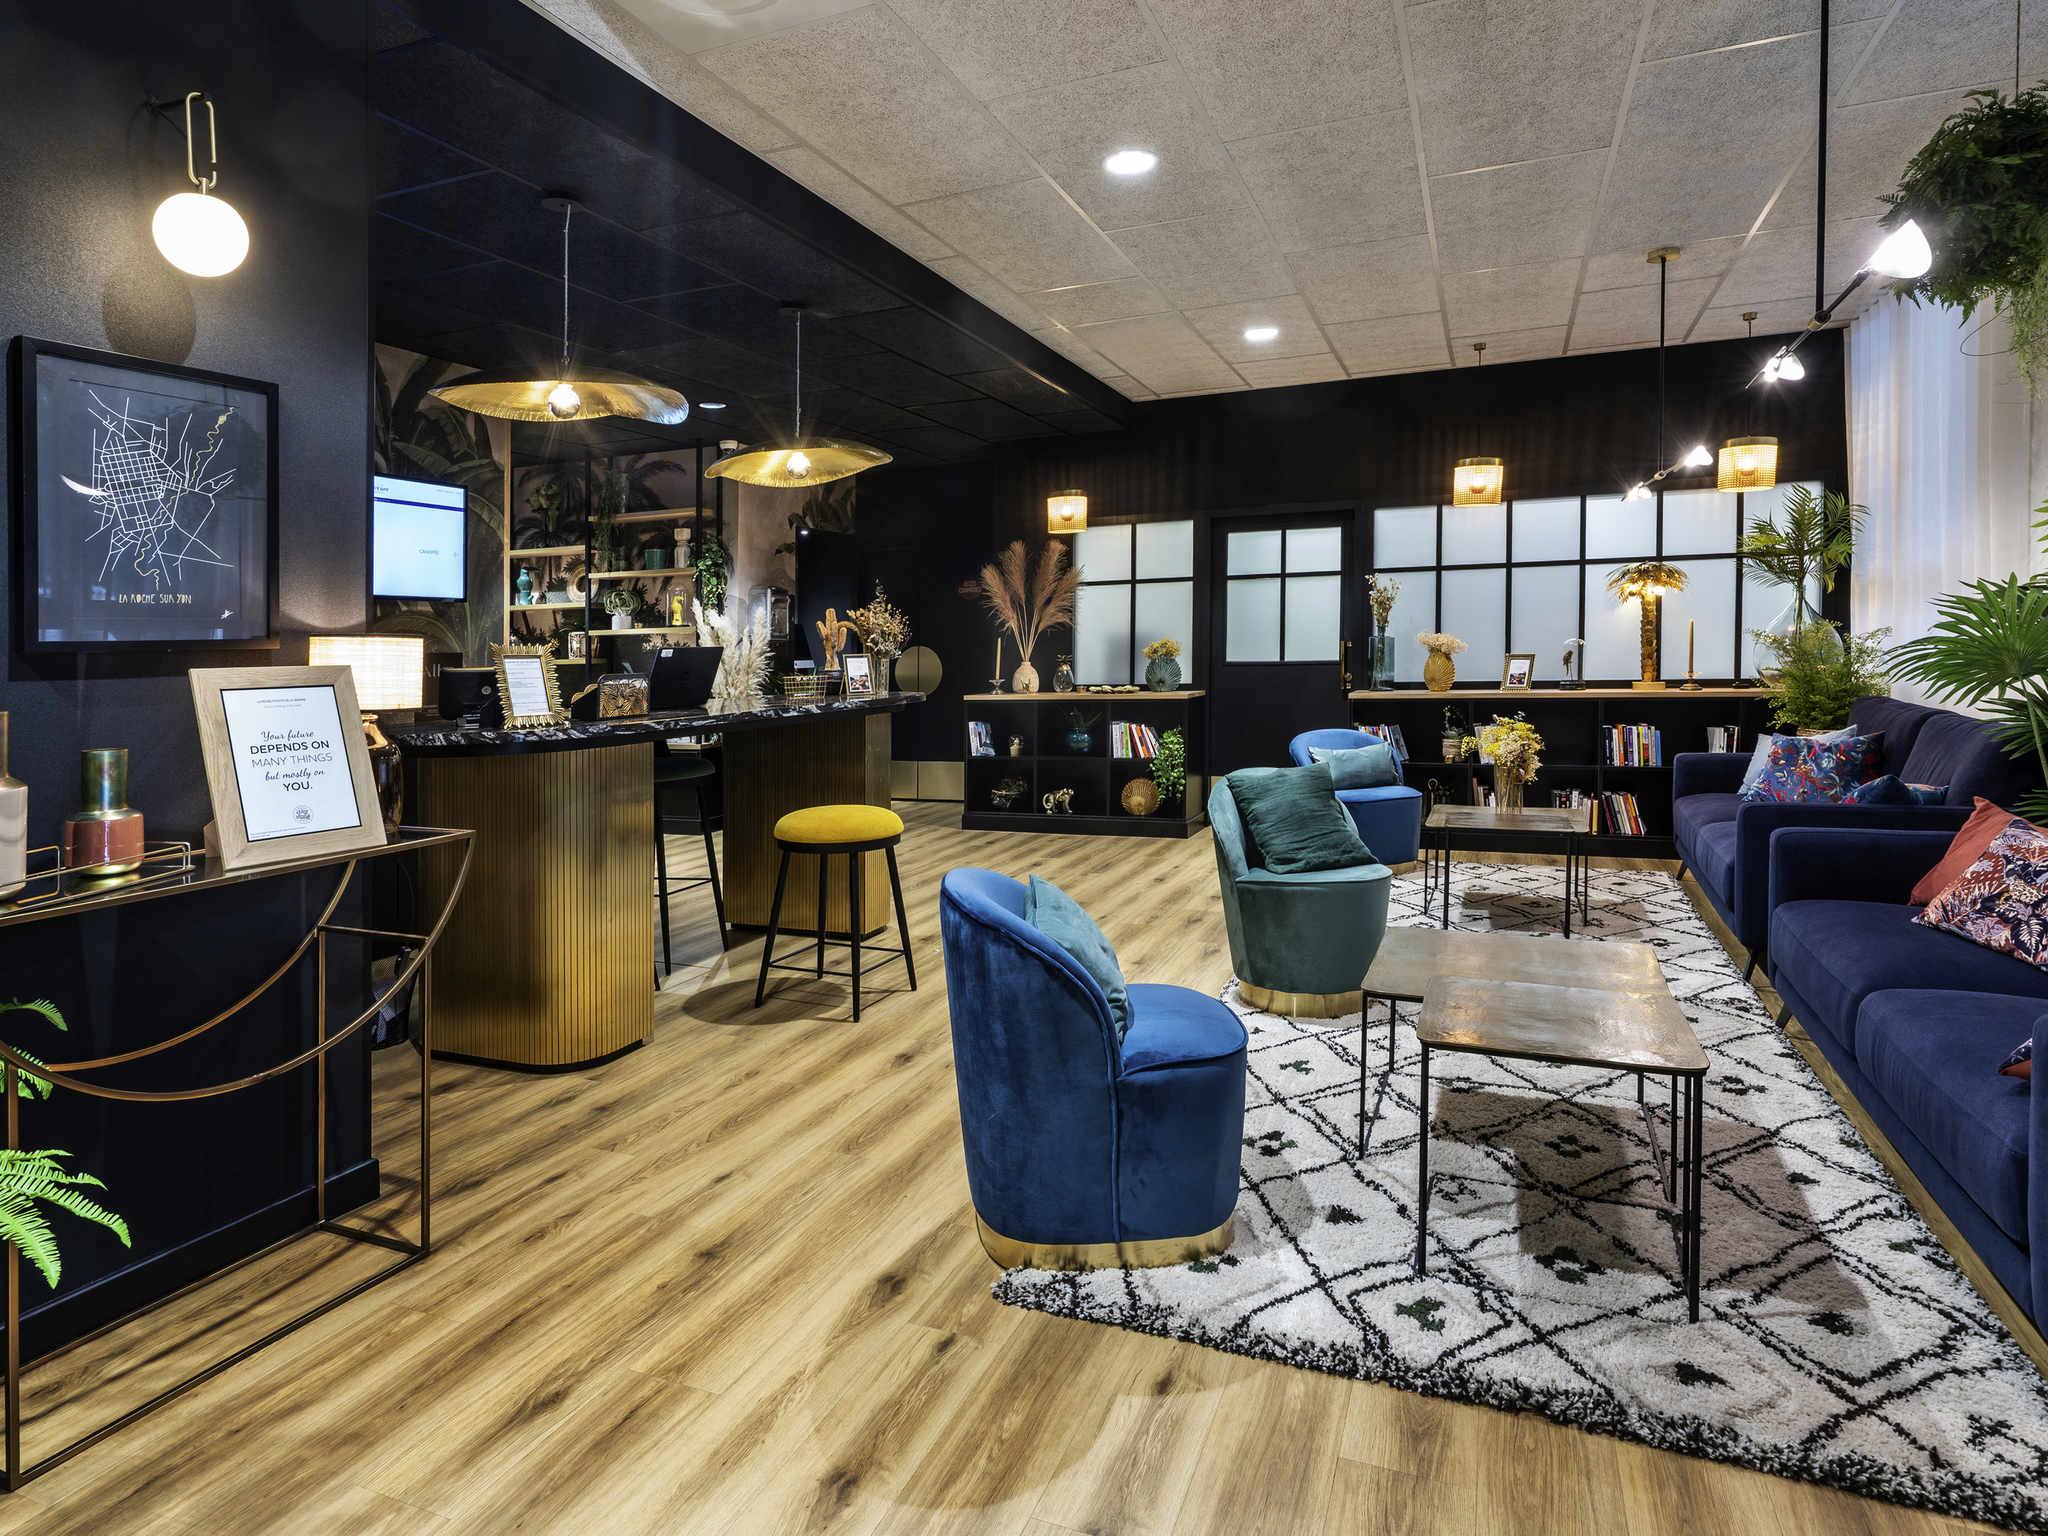 Hotel – Hotel Mercure La Roche Sur Yon Centre